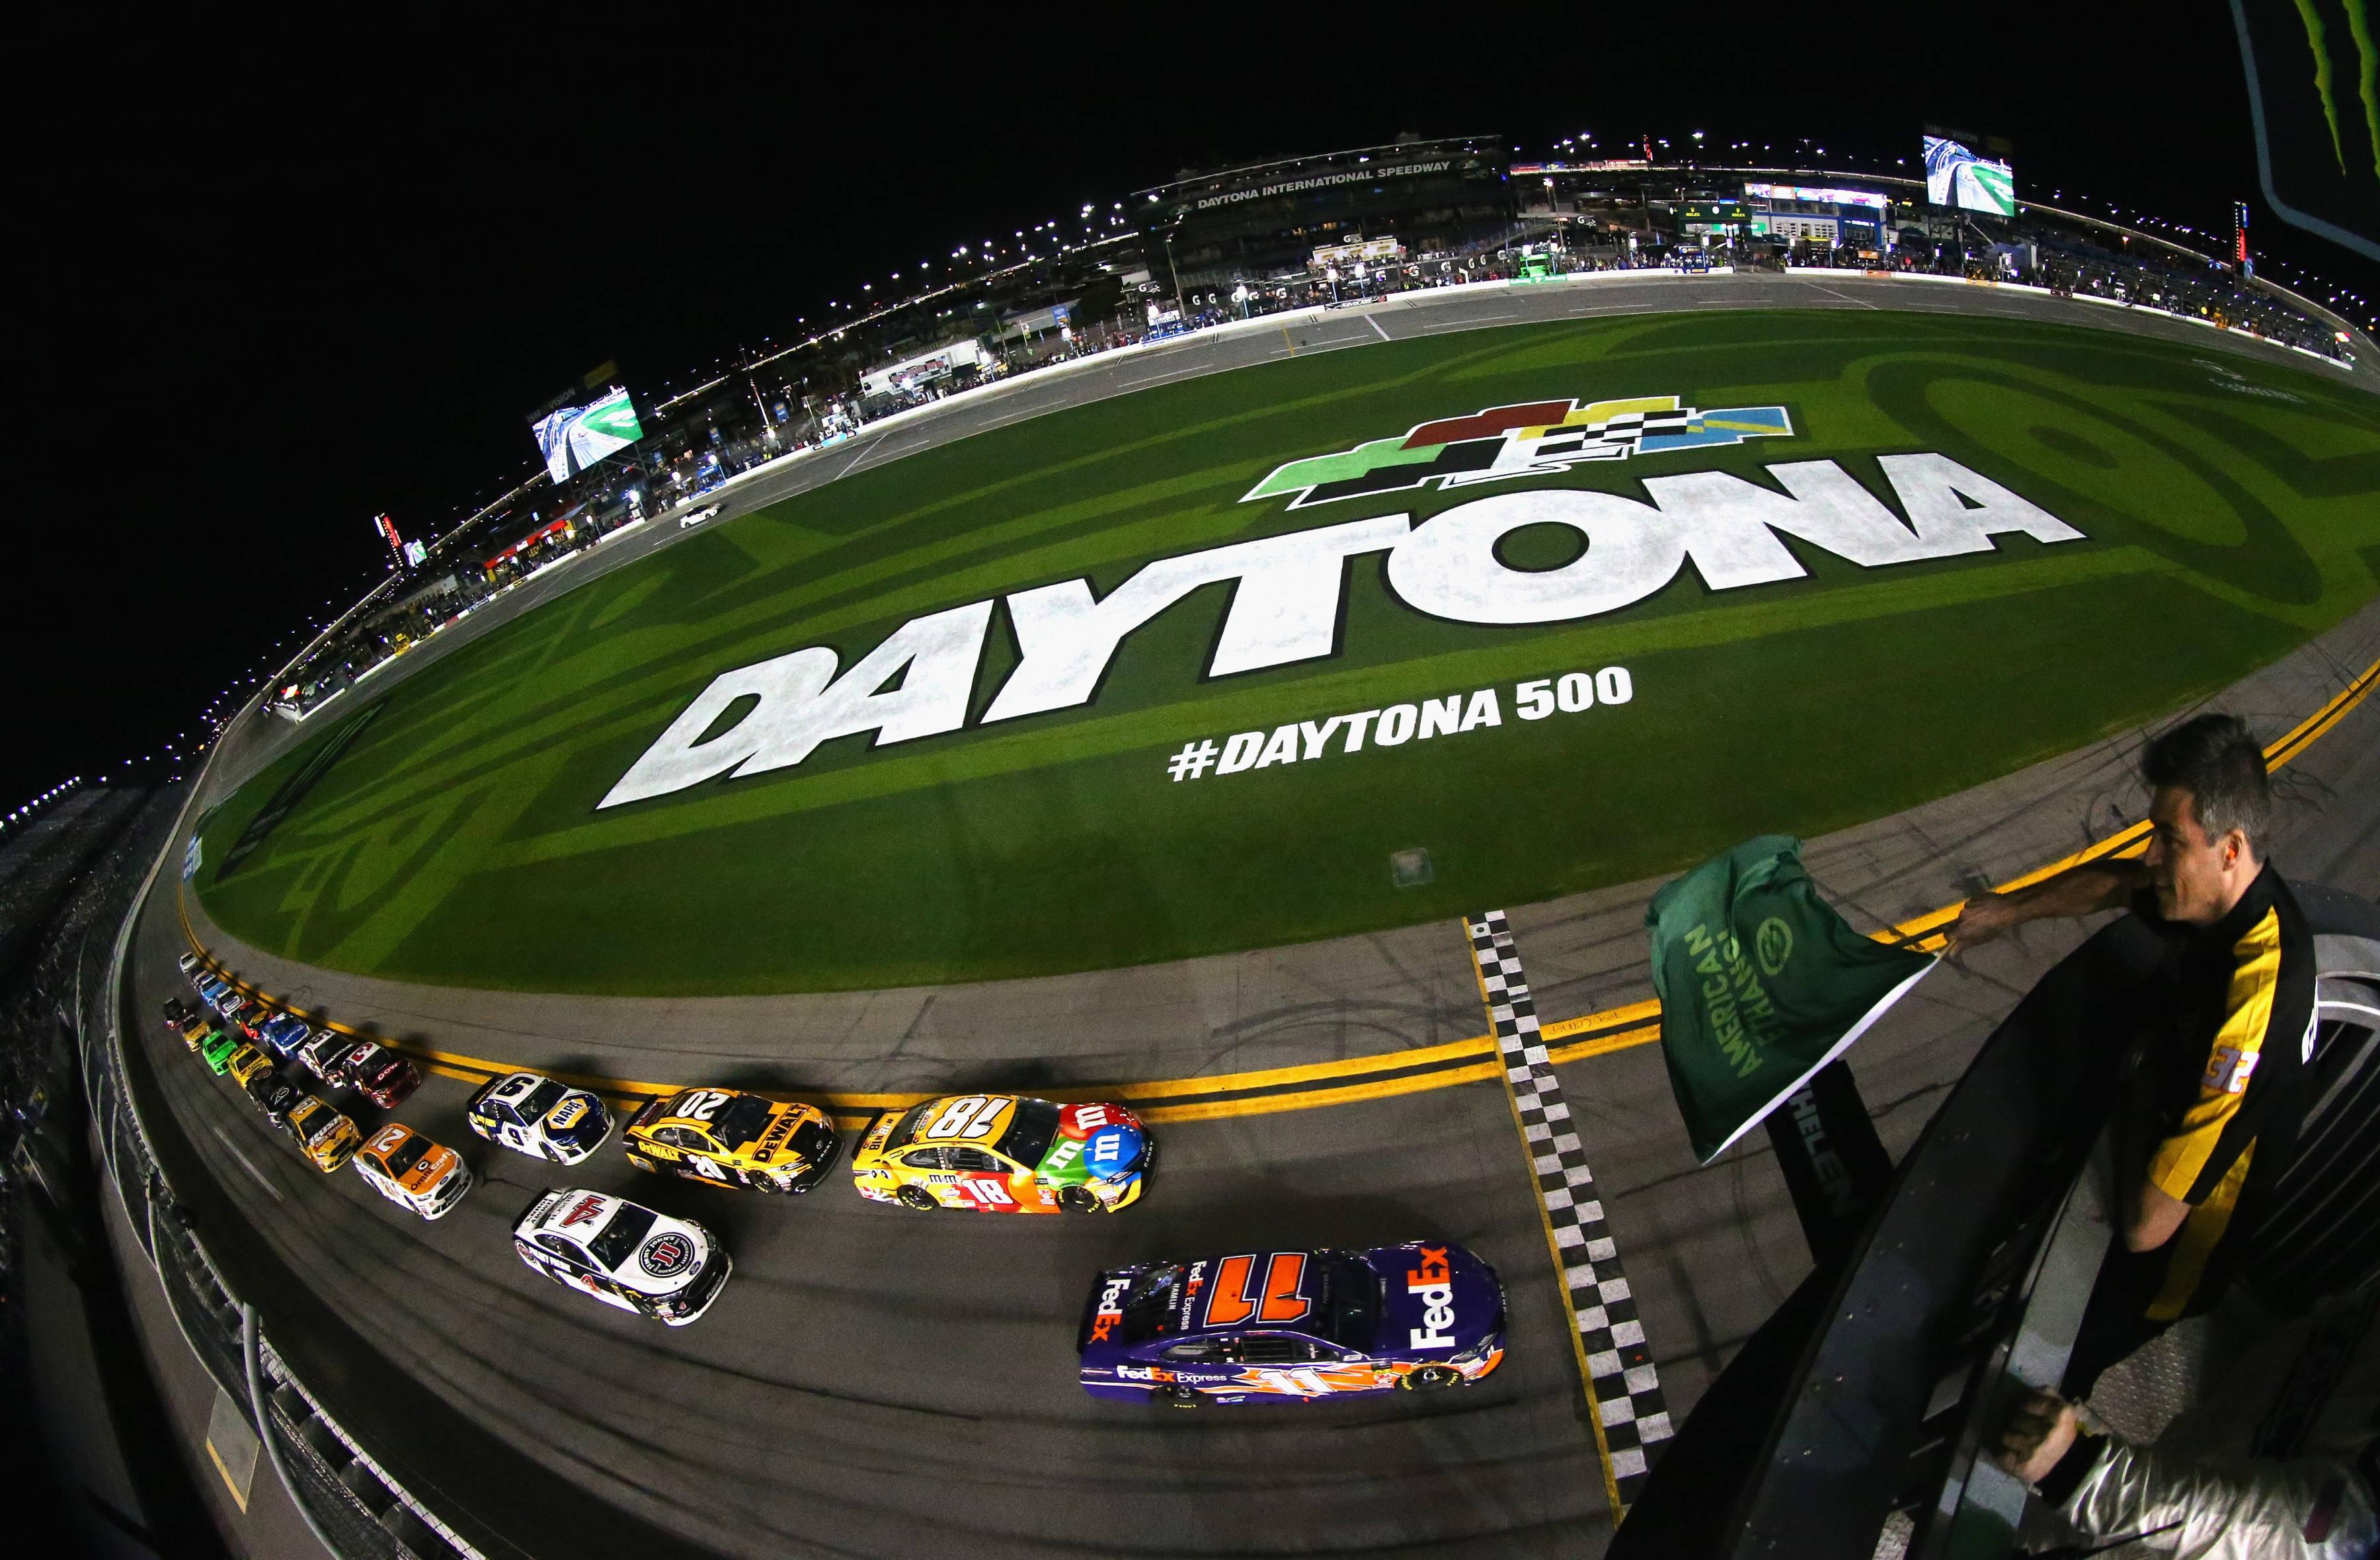 Daytona Duels - Denny Hamlin and Kyle Busch